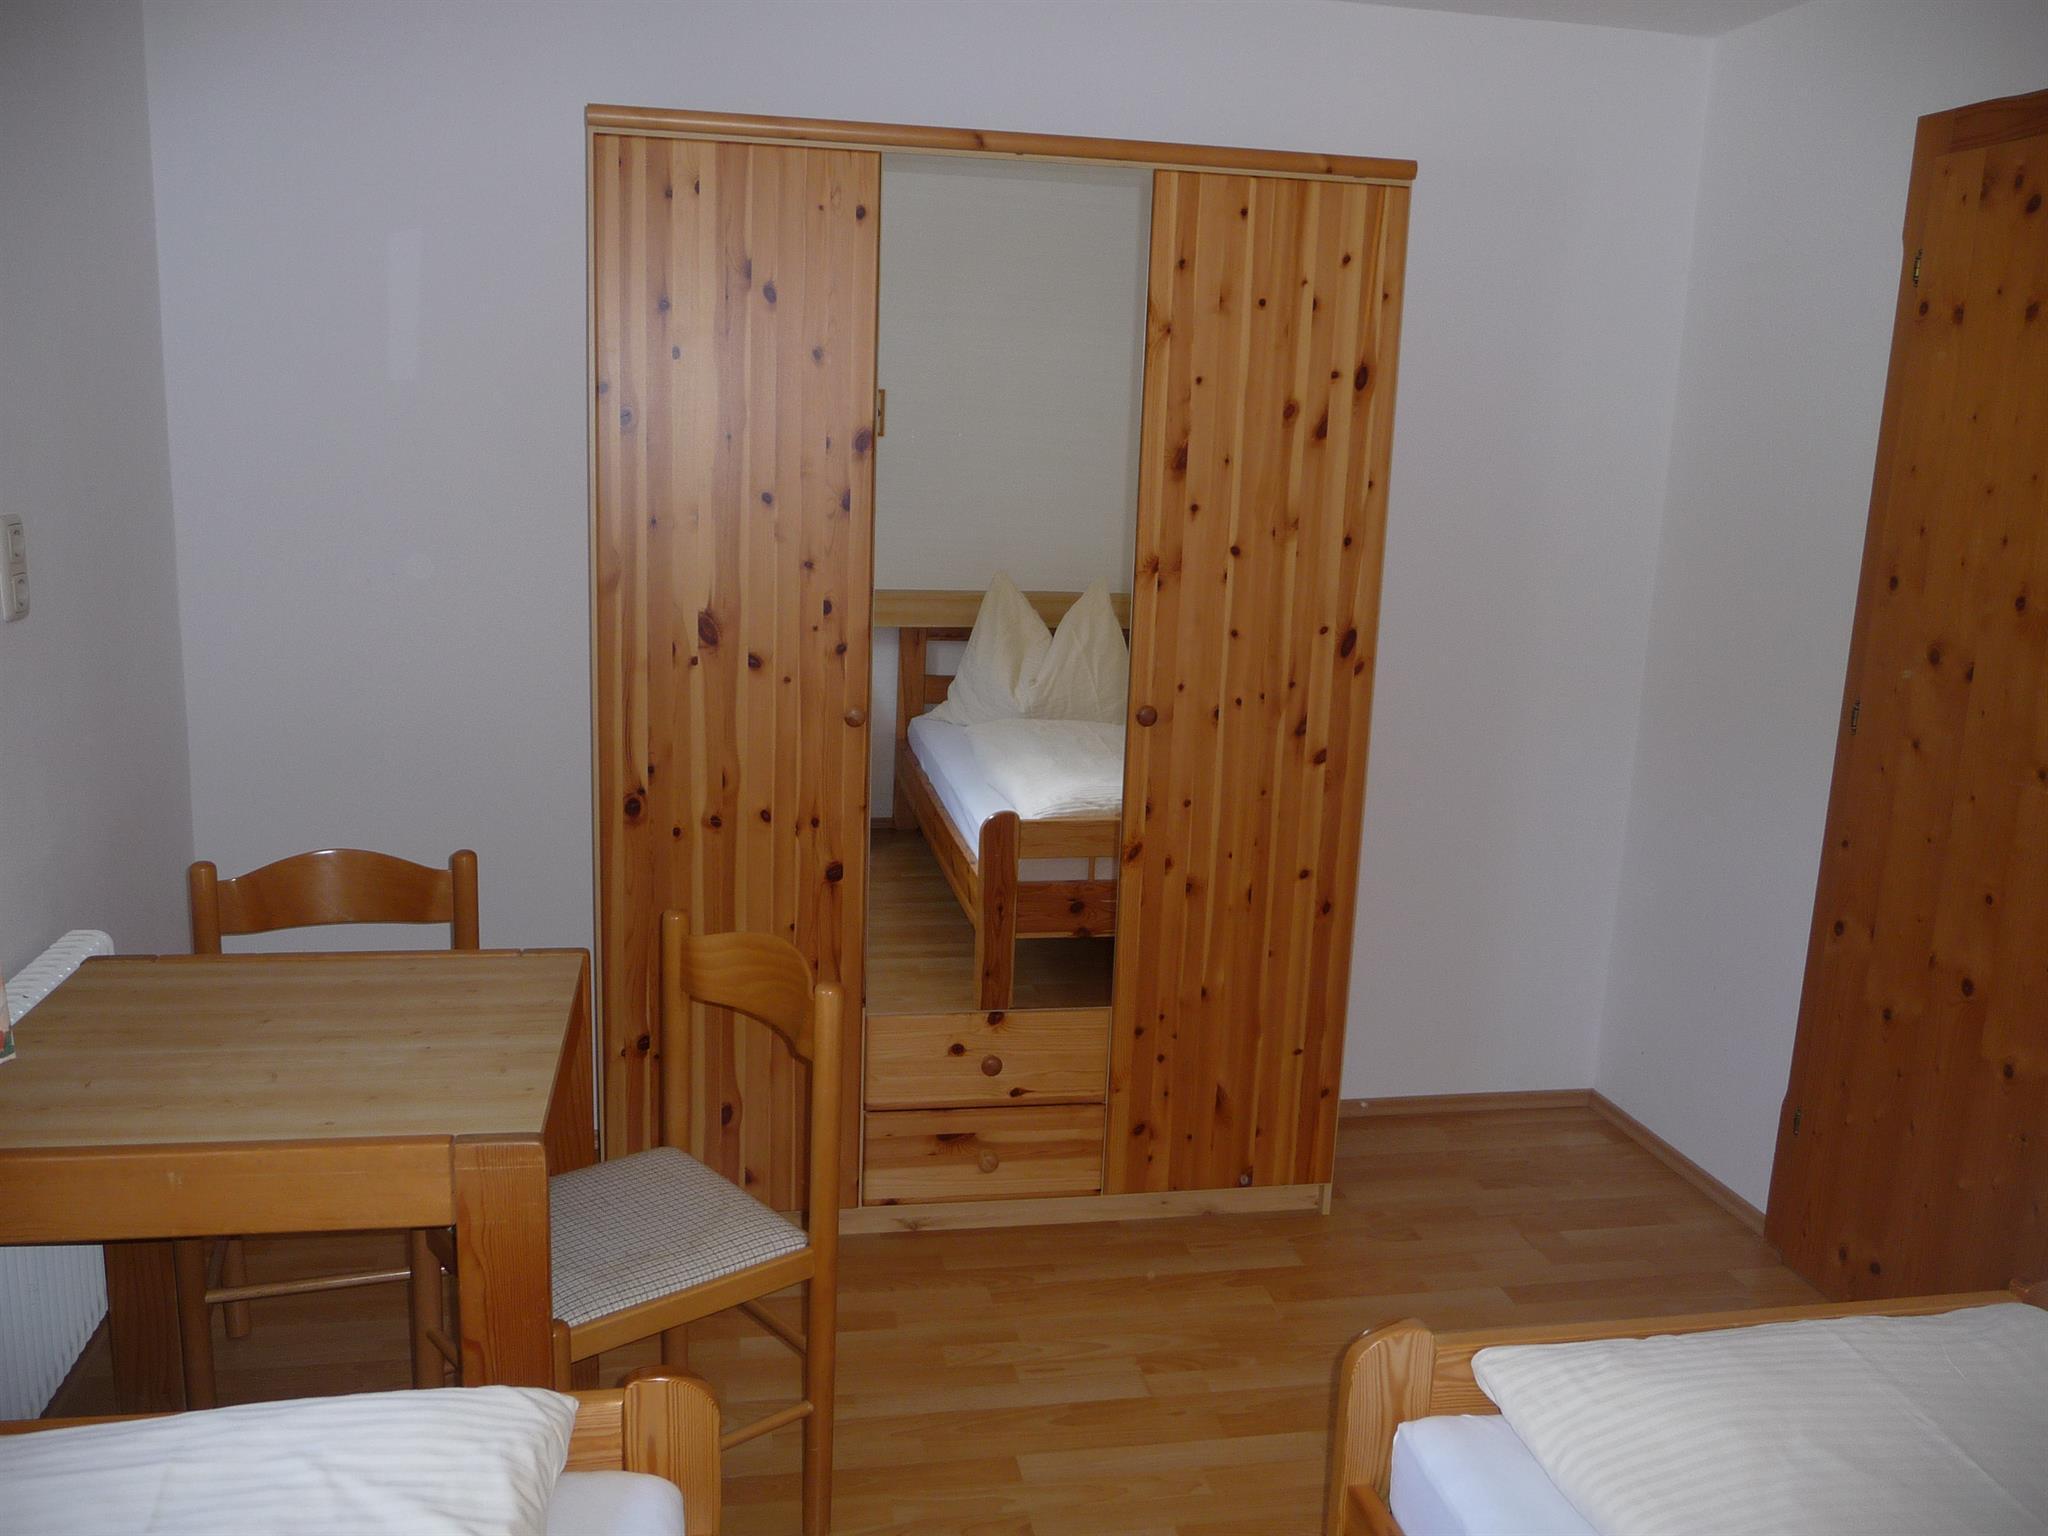 Appartement de vacances Haus Lindeneck - Erika Schwentner Grosses Appartement, 2 Räume/Südbalkon (627210), Kössen, Kaiserwinkl, Tyrol, Autriche, image 19